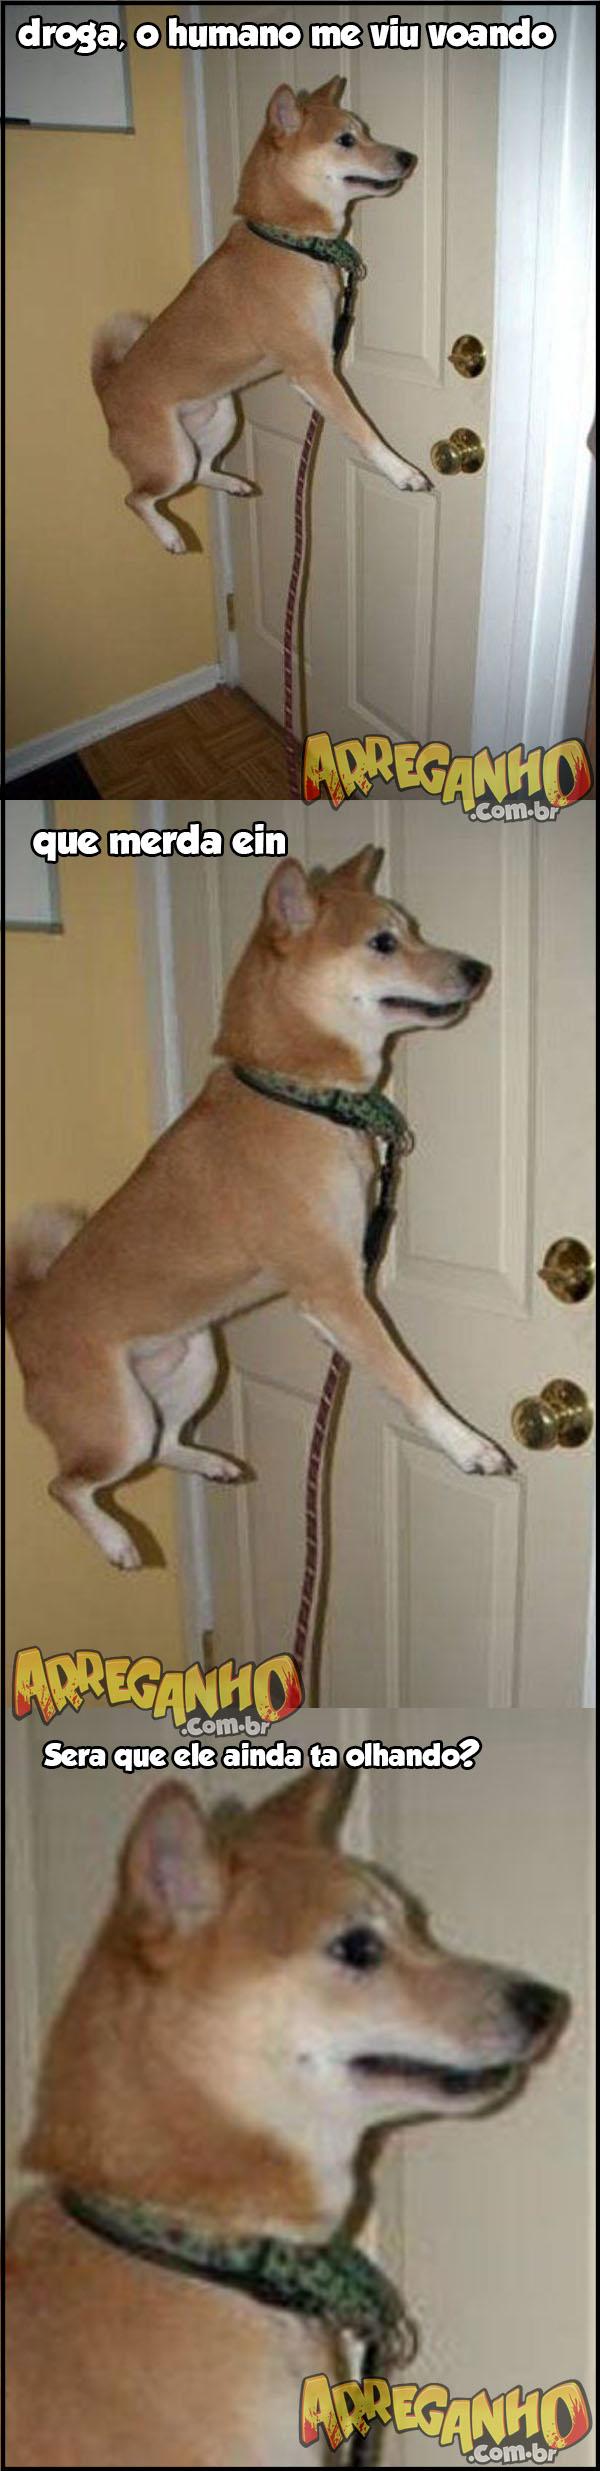 cachorro voador